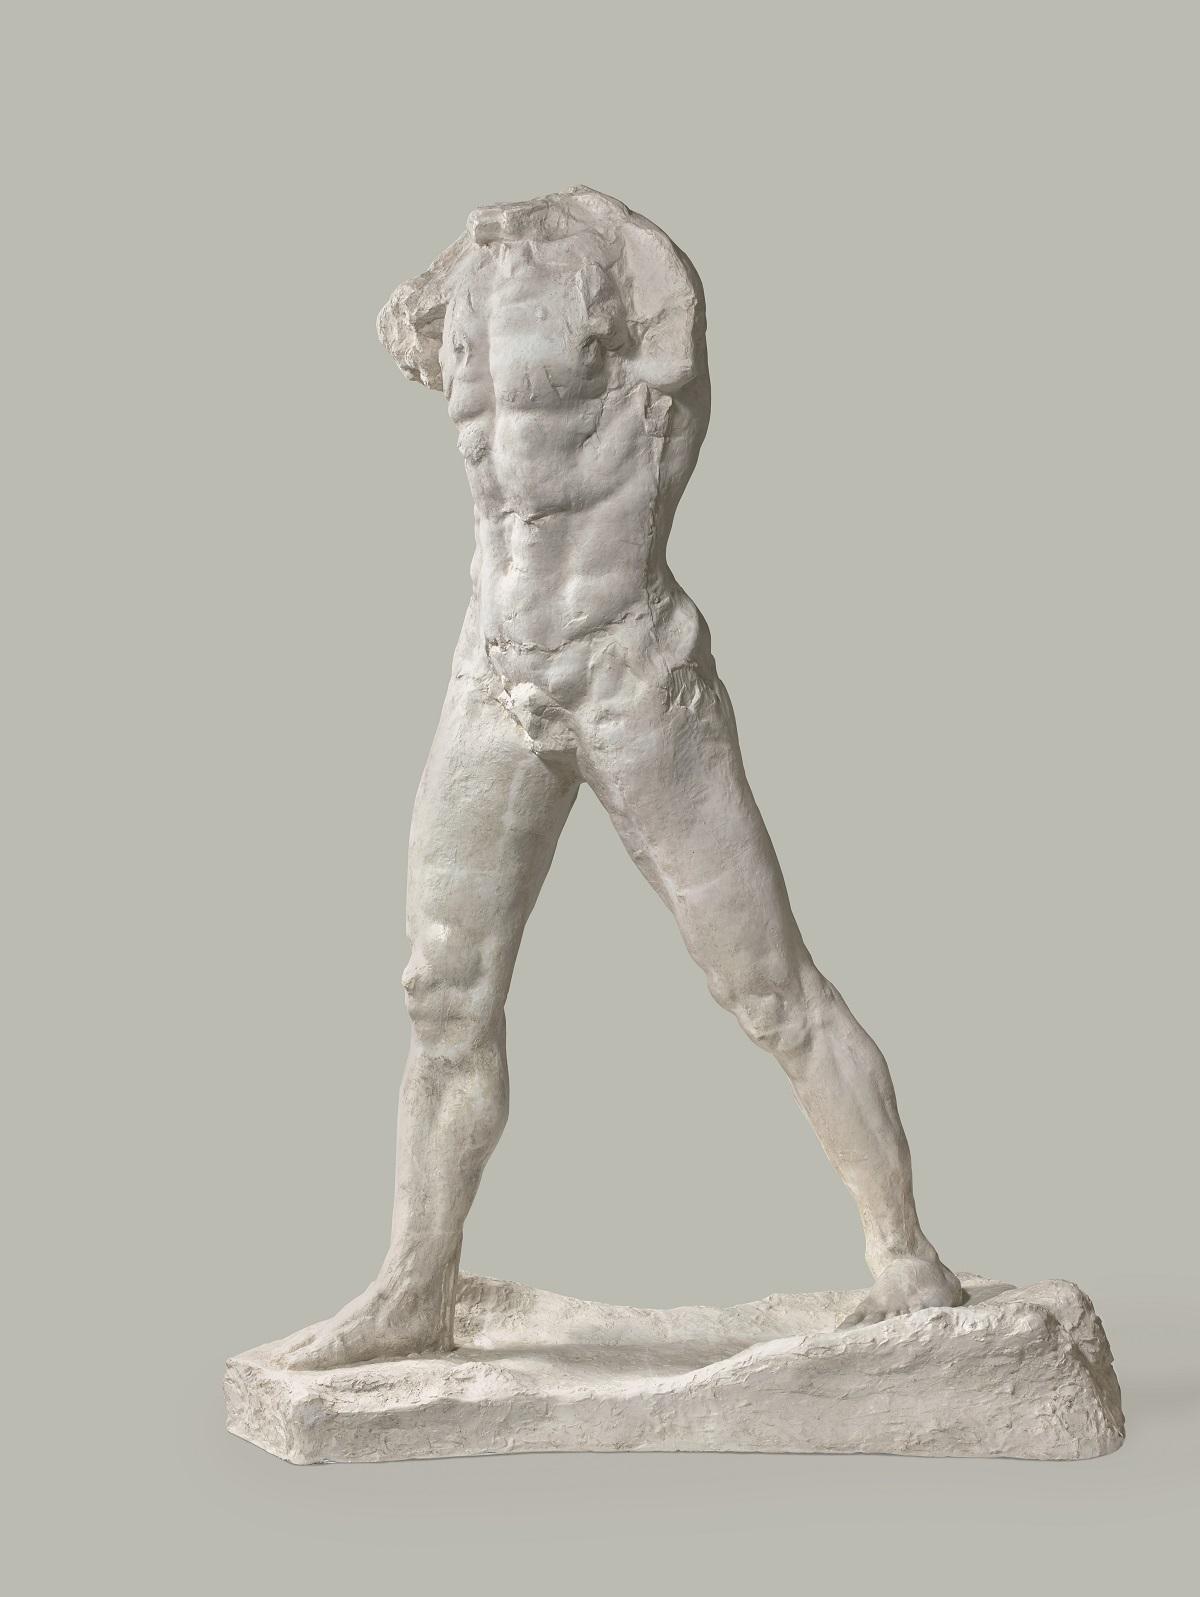 L'Homme qui marche, grand modèle [El hombre que camina, modelo grande] (1907) - Auguste Rodin